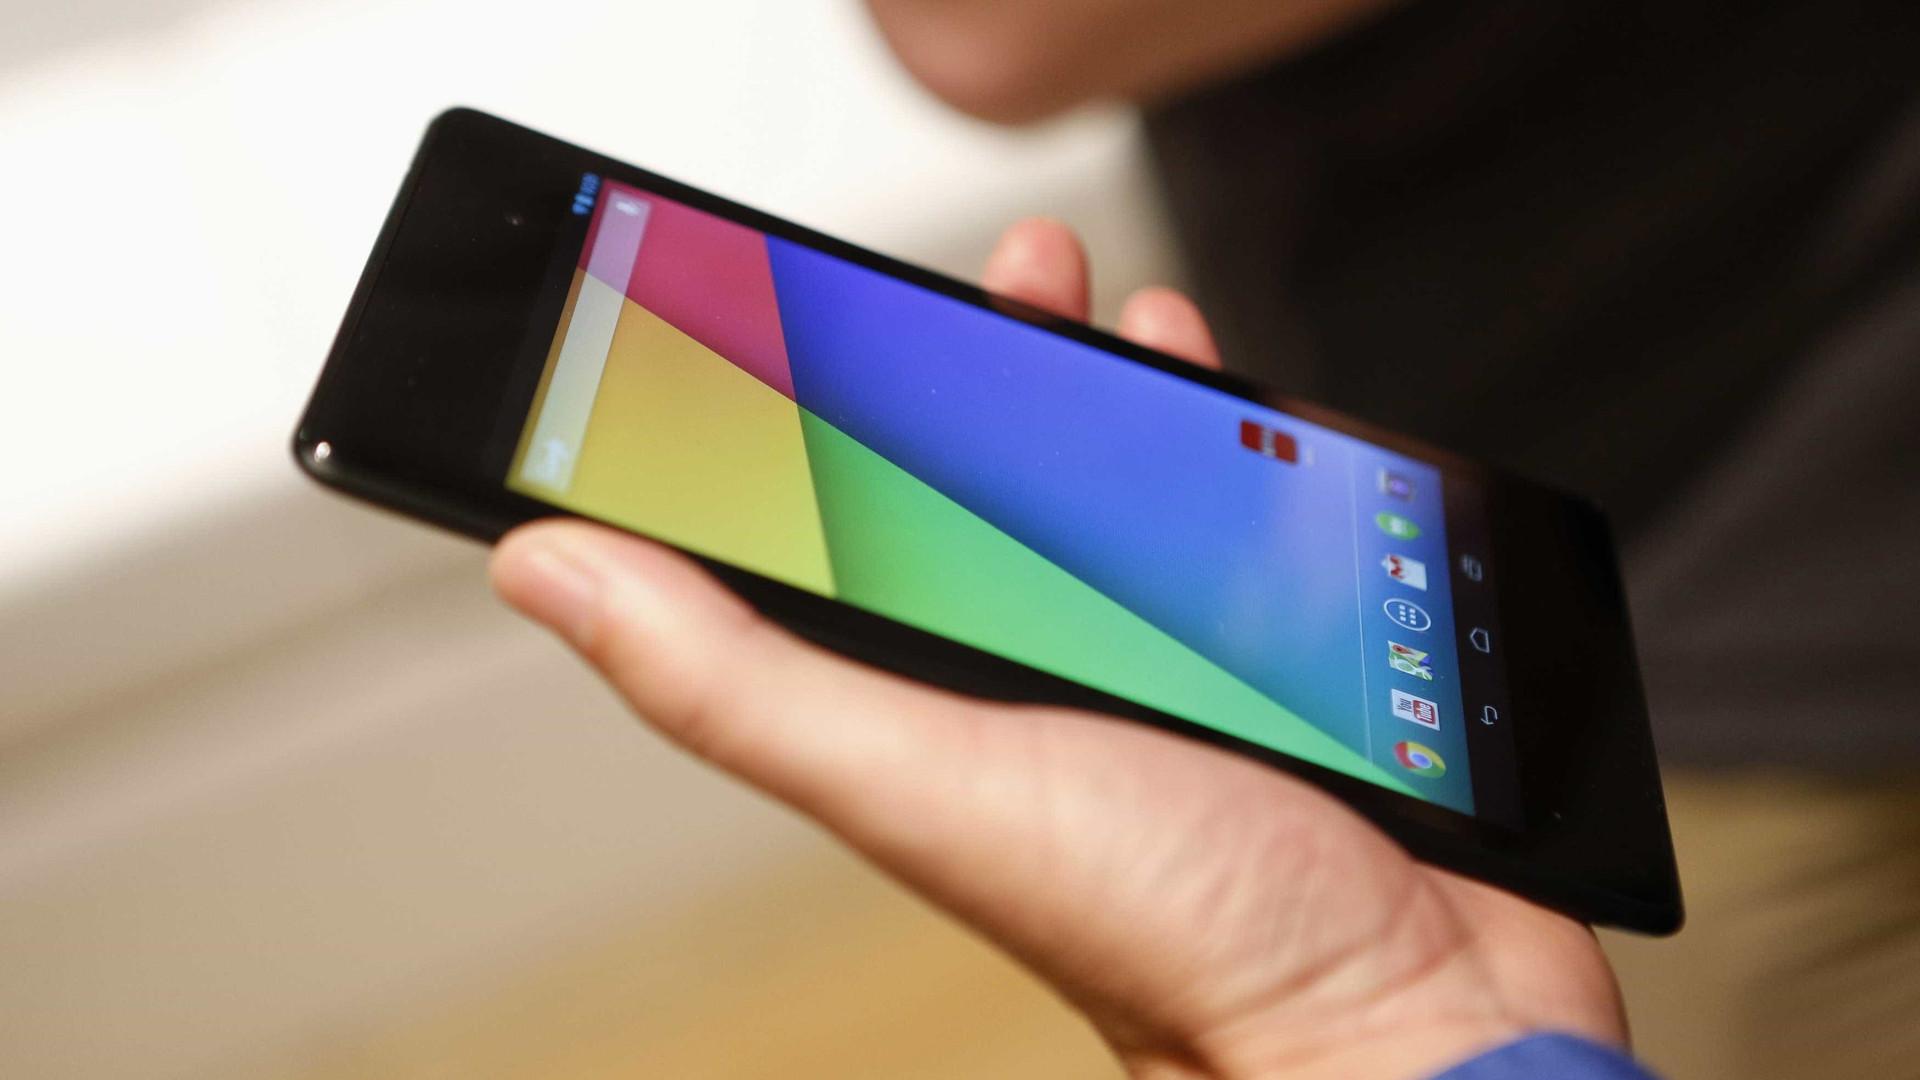 Google garante que assistente digital por telefone será identificado